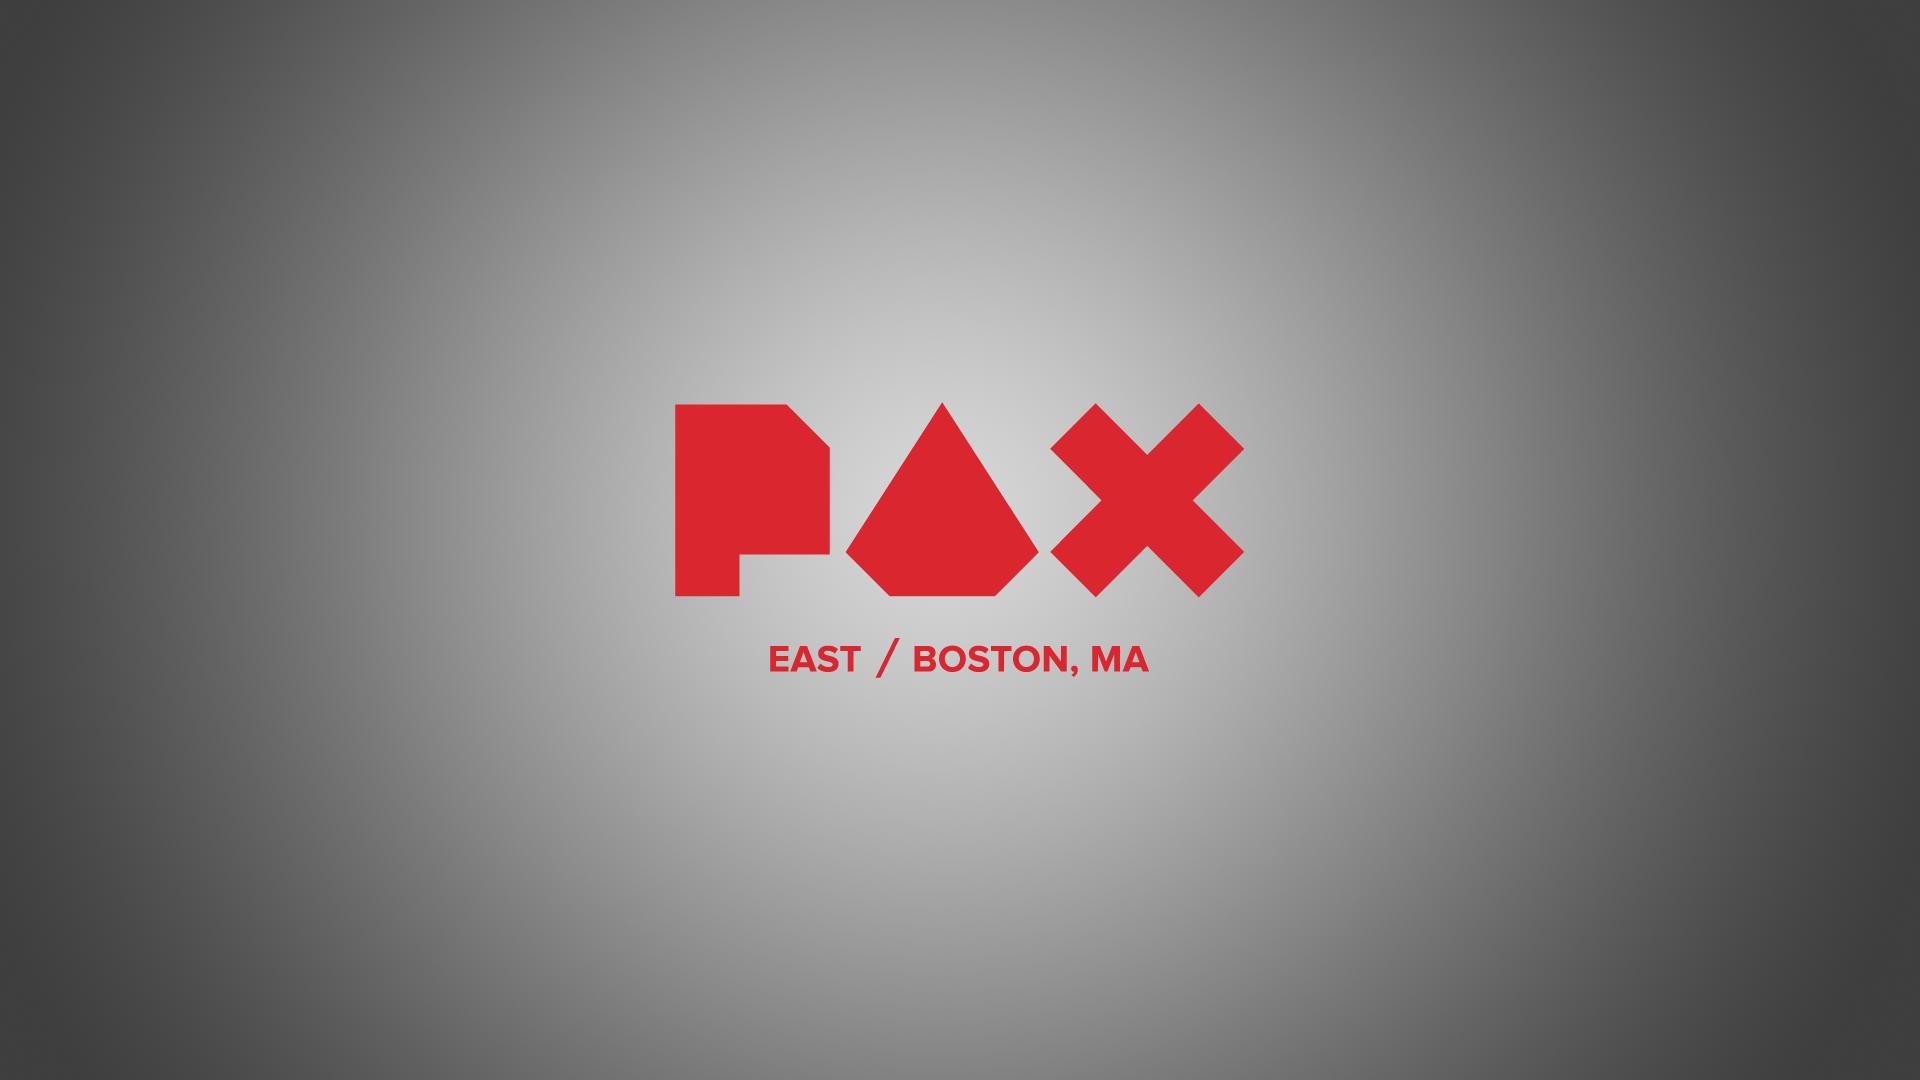 Pax East Boston